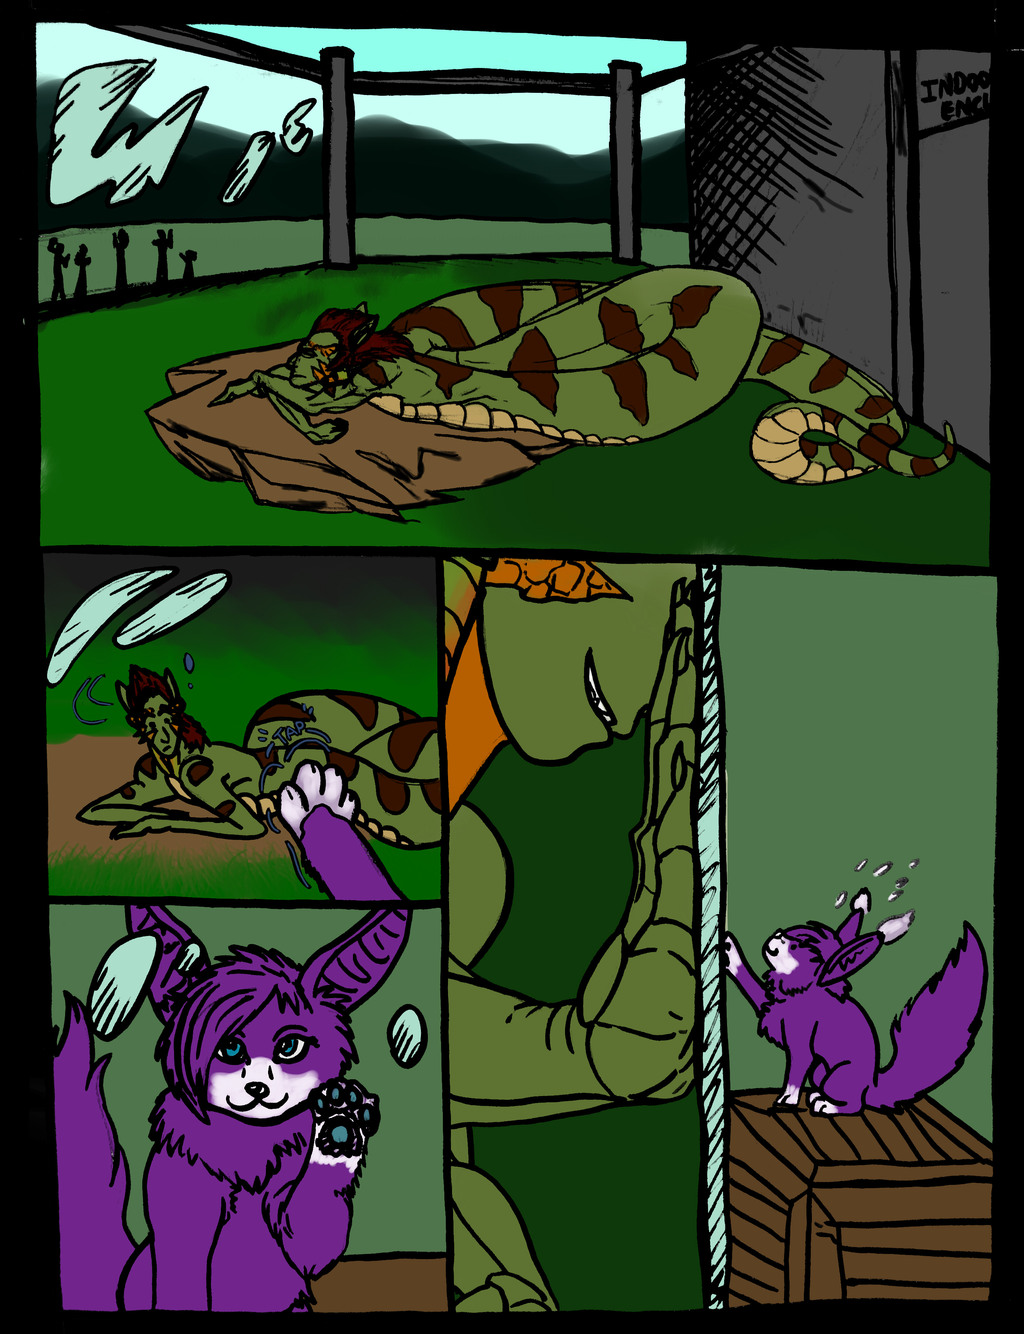 (FLUFF COMIC) Foxelot Friend